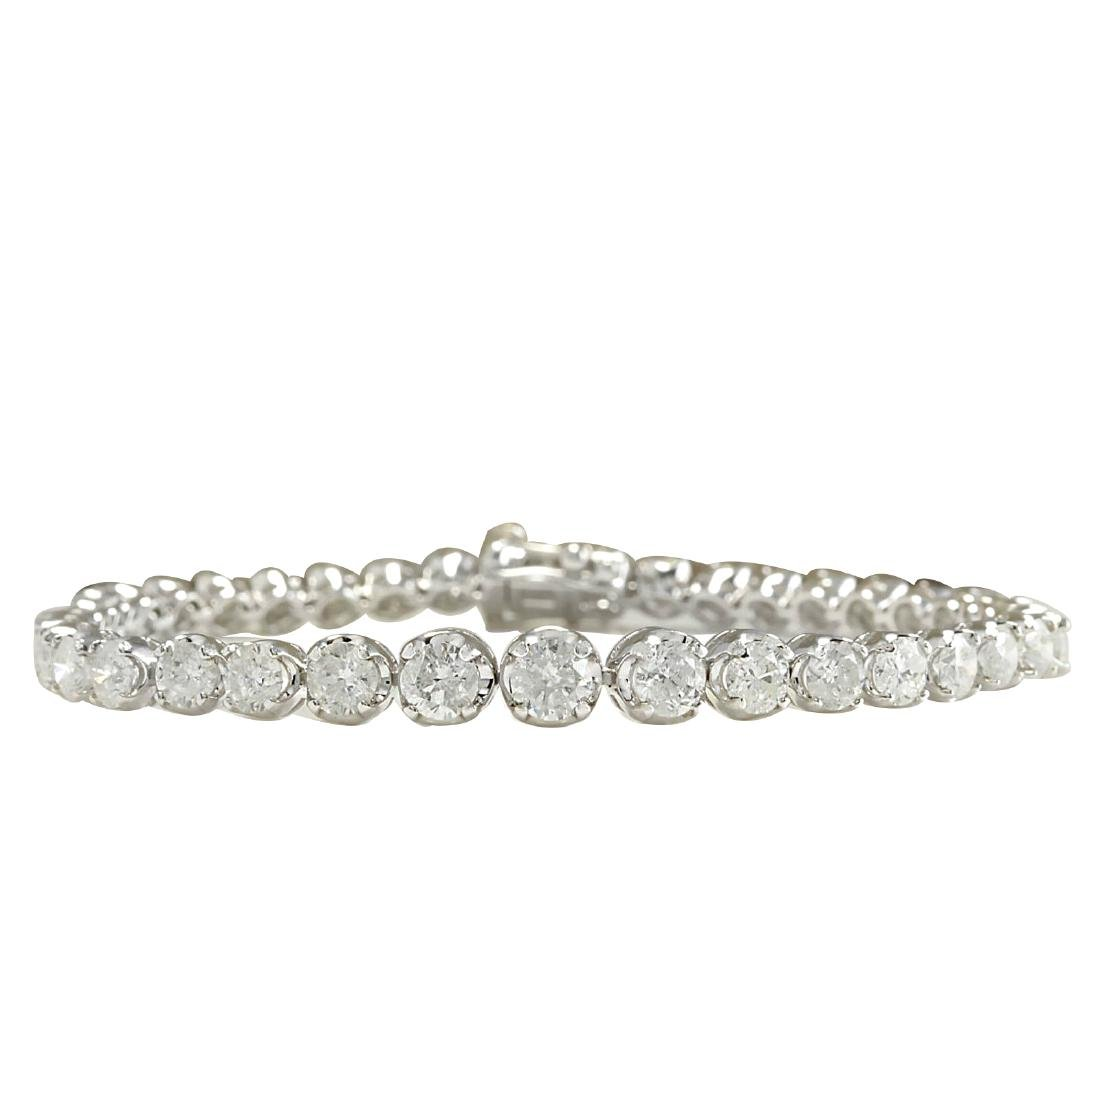 7.50CTW Natural Diamond Bracelet In 18K Solid White